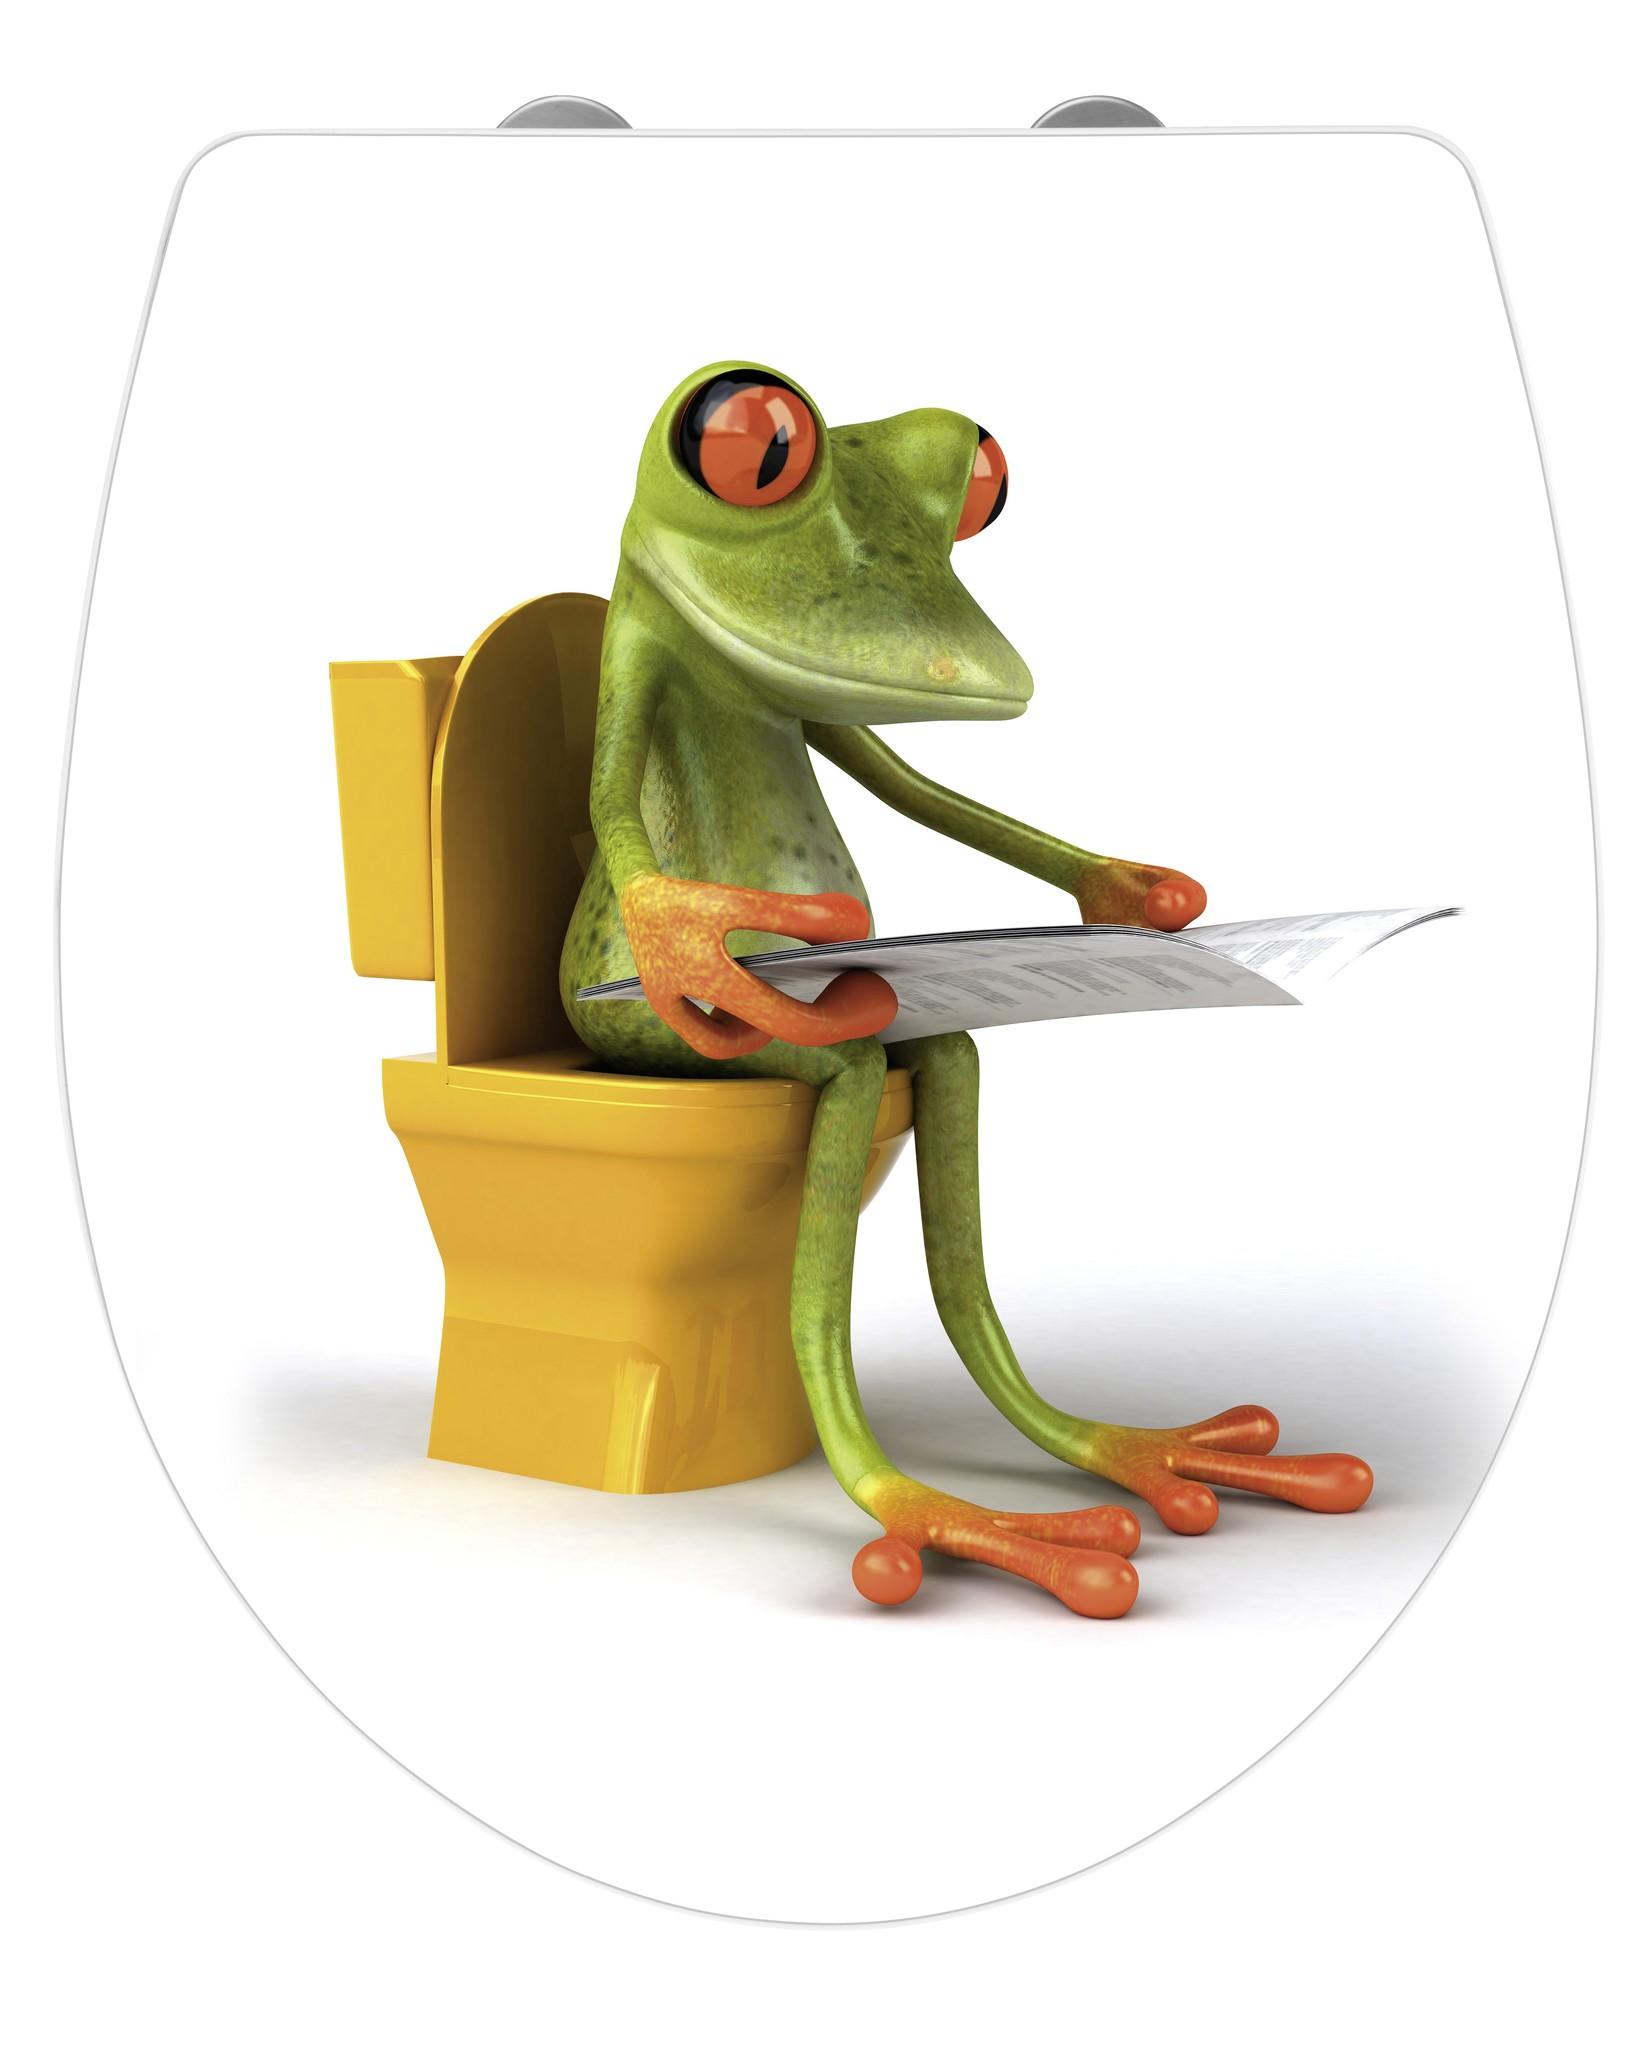 WC-Sitz Hochglanz Acryl Frog News, Absenkautomatik, Fix-Clip Hygiene Befestigung